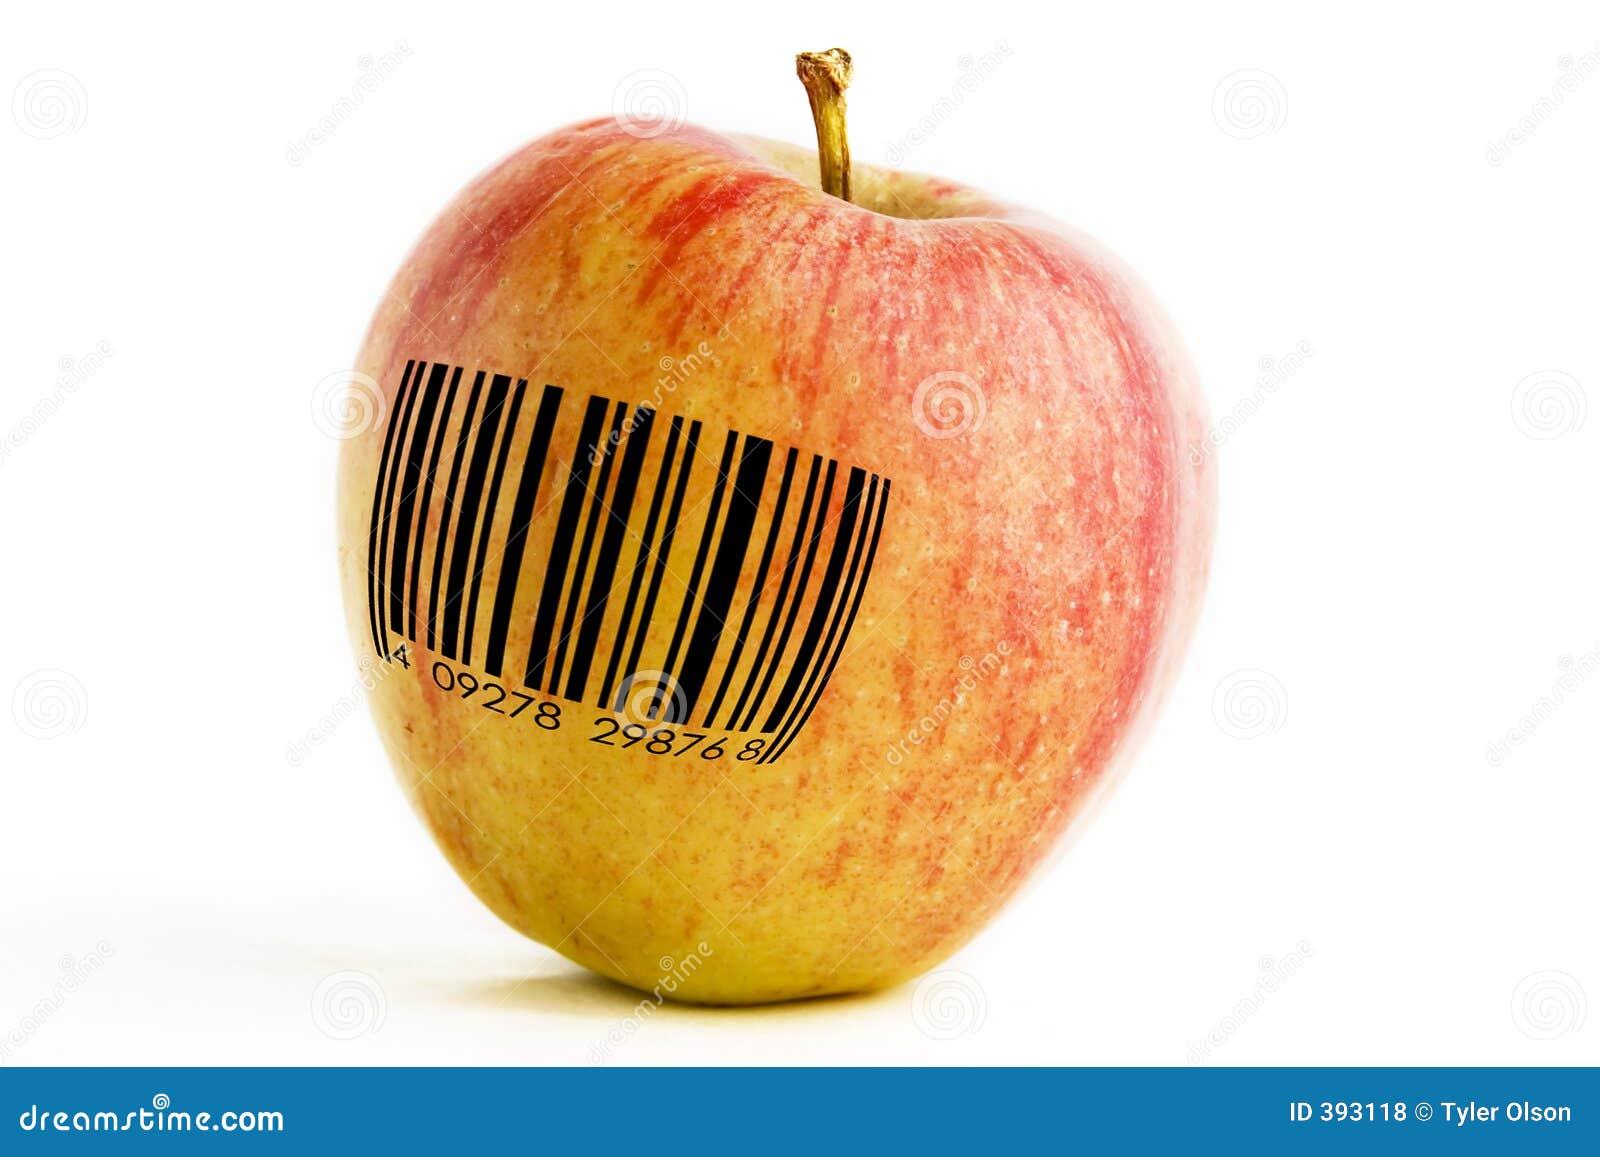 OGM Apple